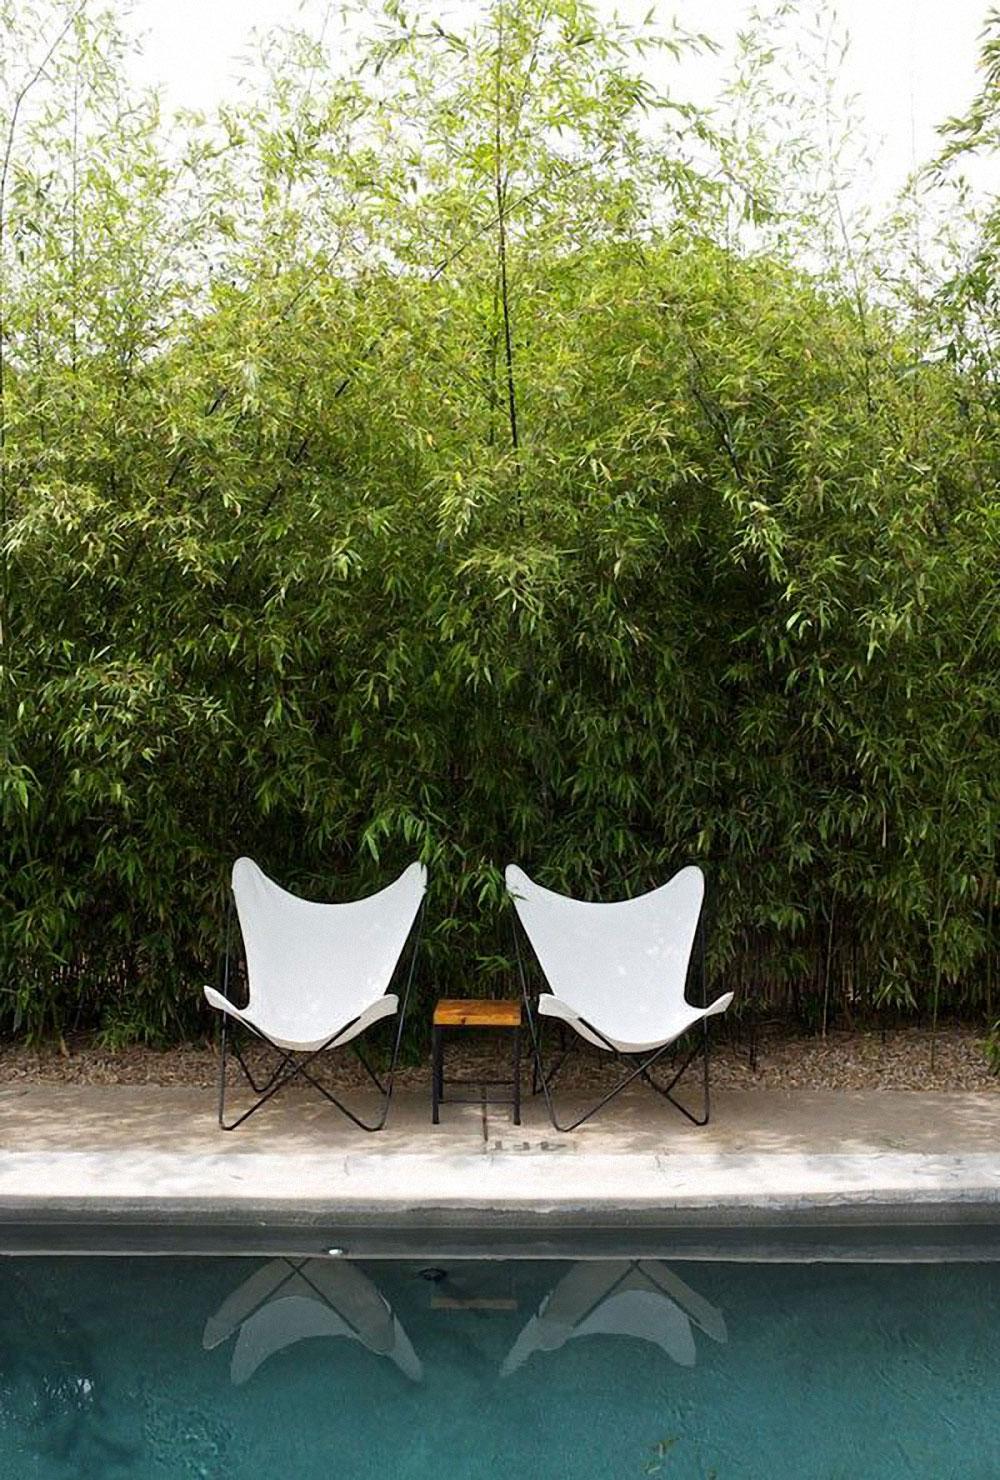 jestcafe.com---Butterfly-chair13